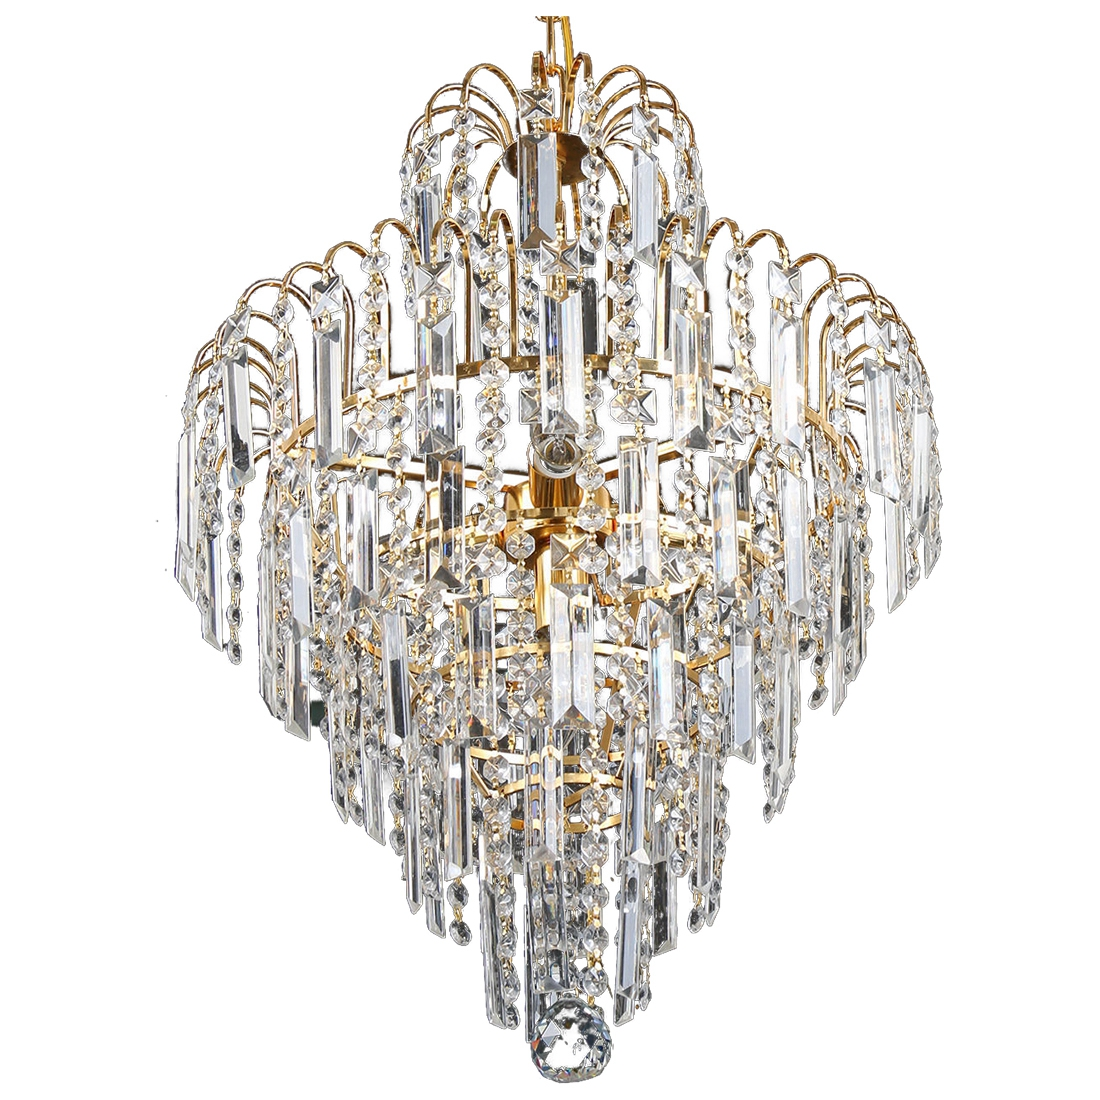 Luxury Big Crystal Chan delier Modern Lamp Pendant Lighting Fixture luxury big crystal modern ceiling light lamp lighting fixture